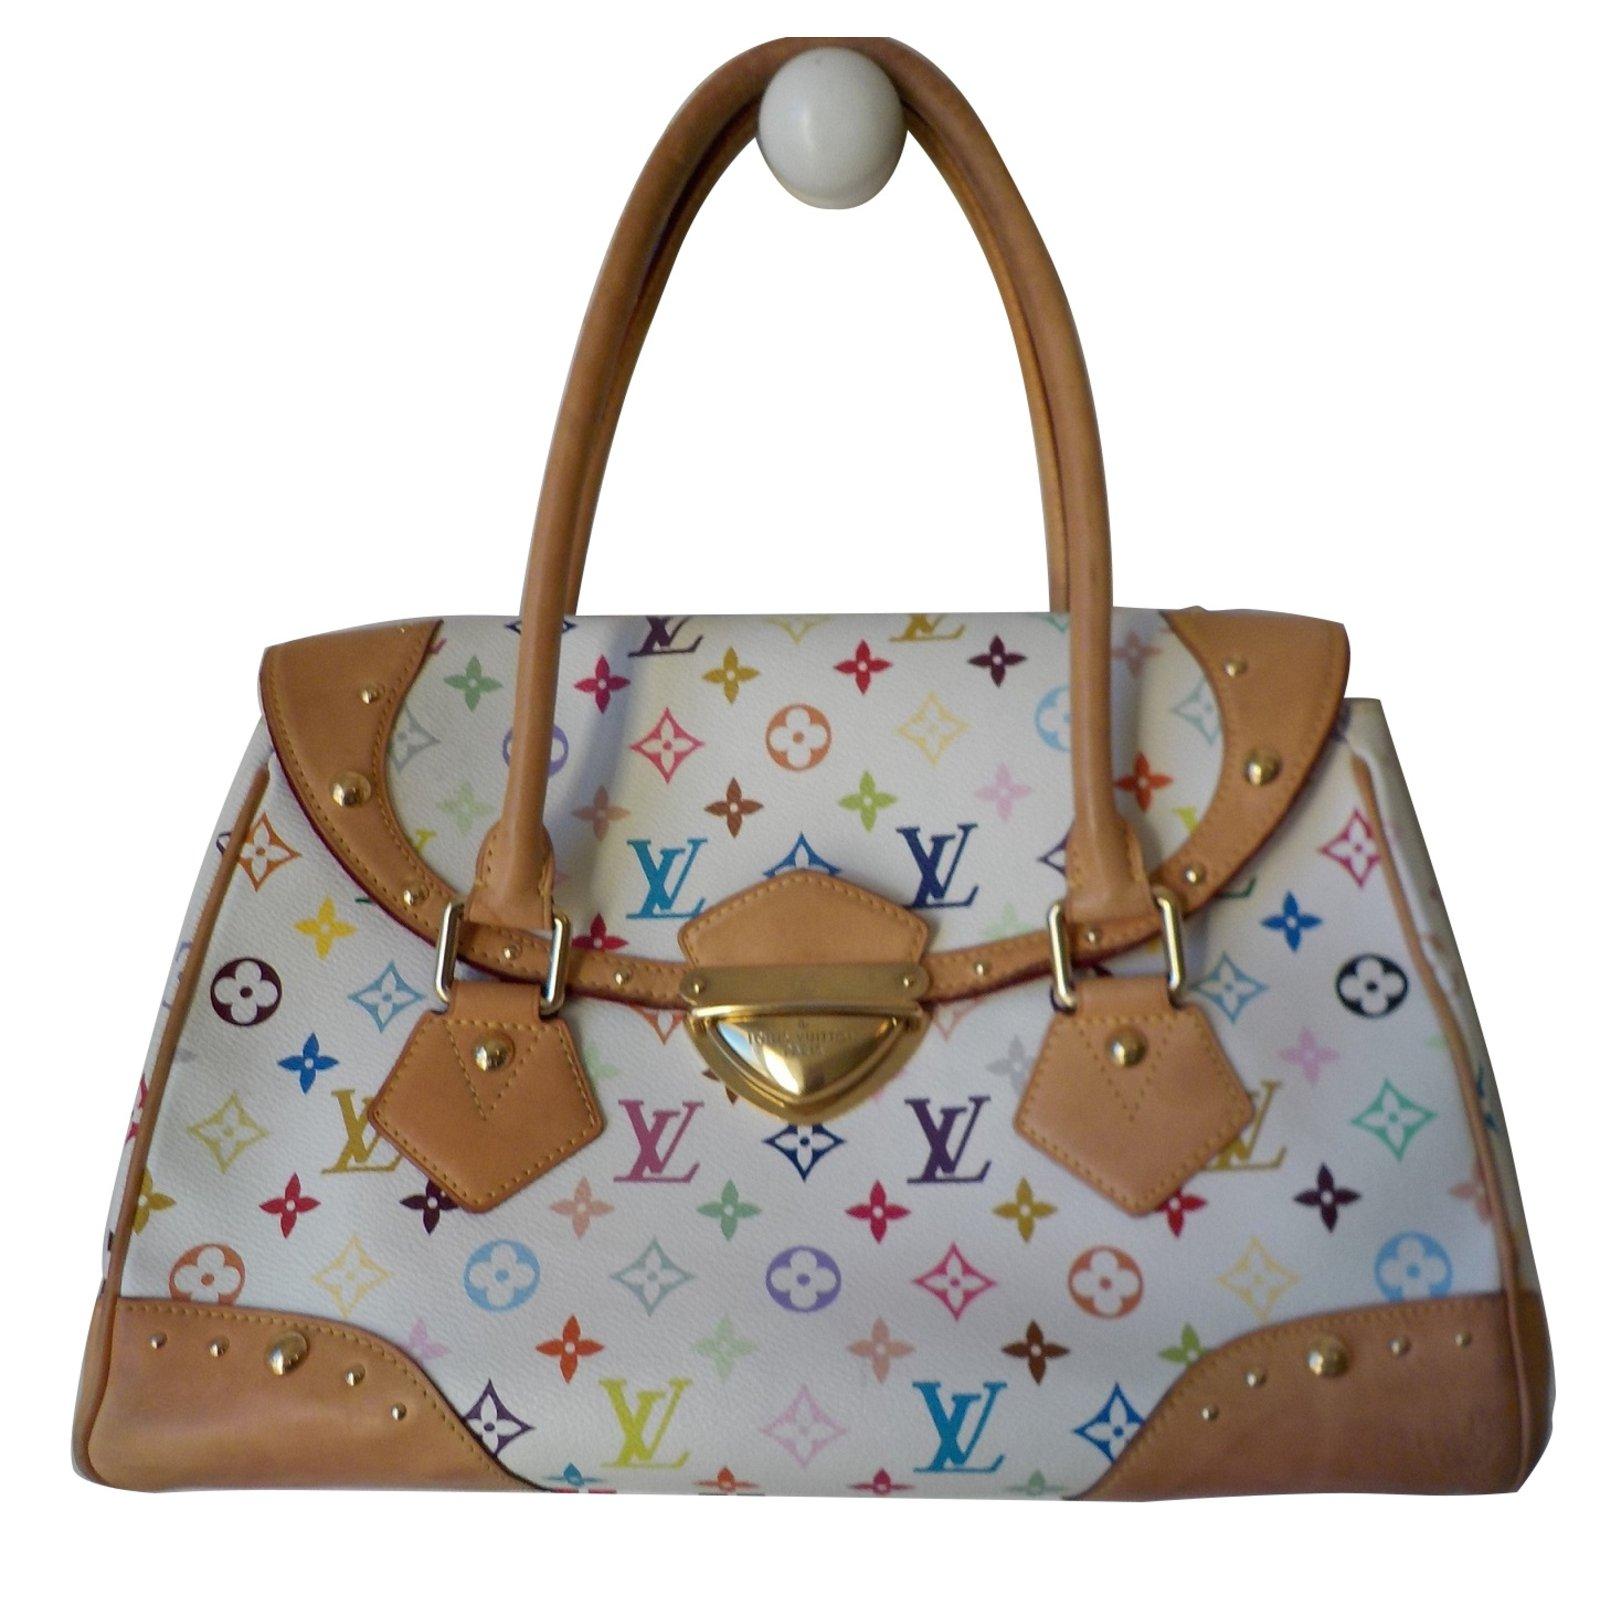 louis vuitton handbags handbags leathercloth white ref